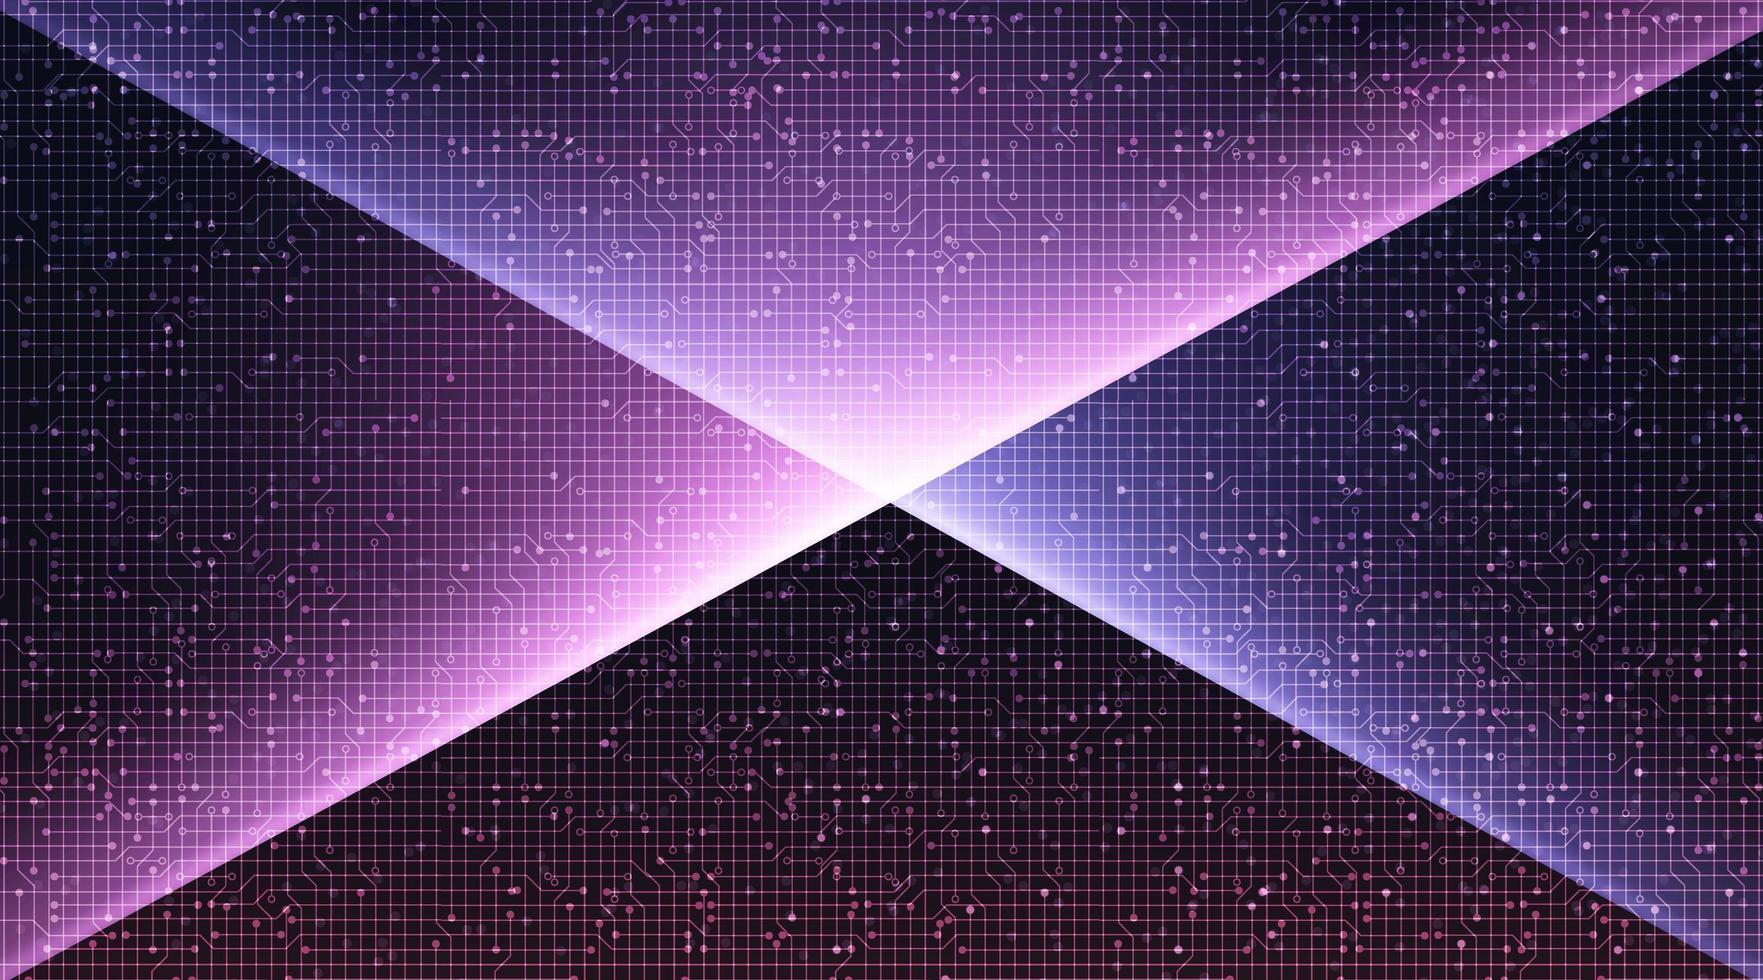 Ljus violett teknologibakgrund. vektor